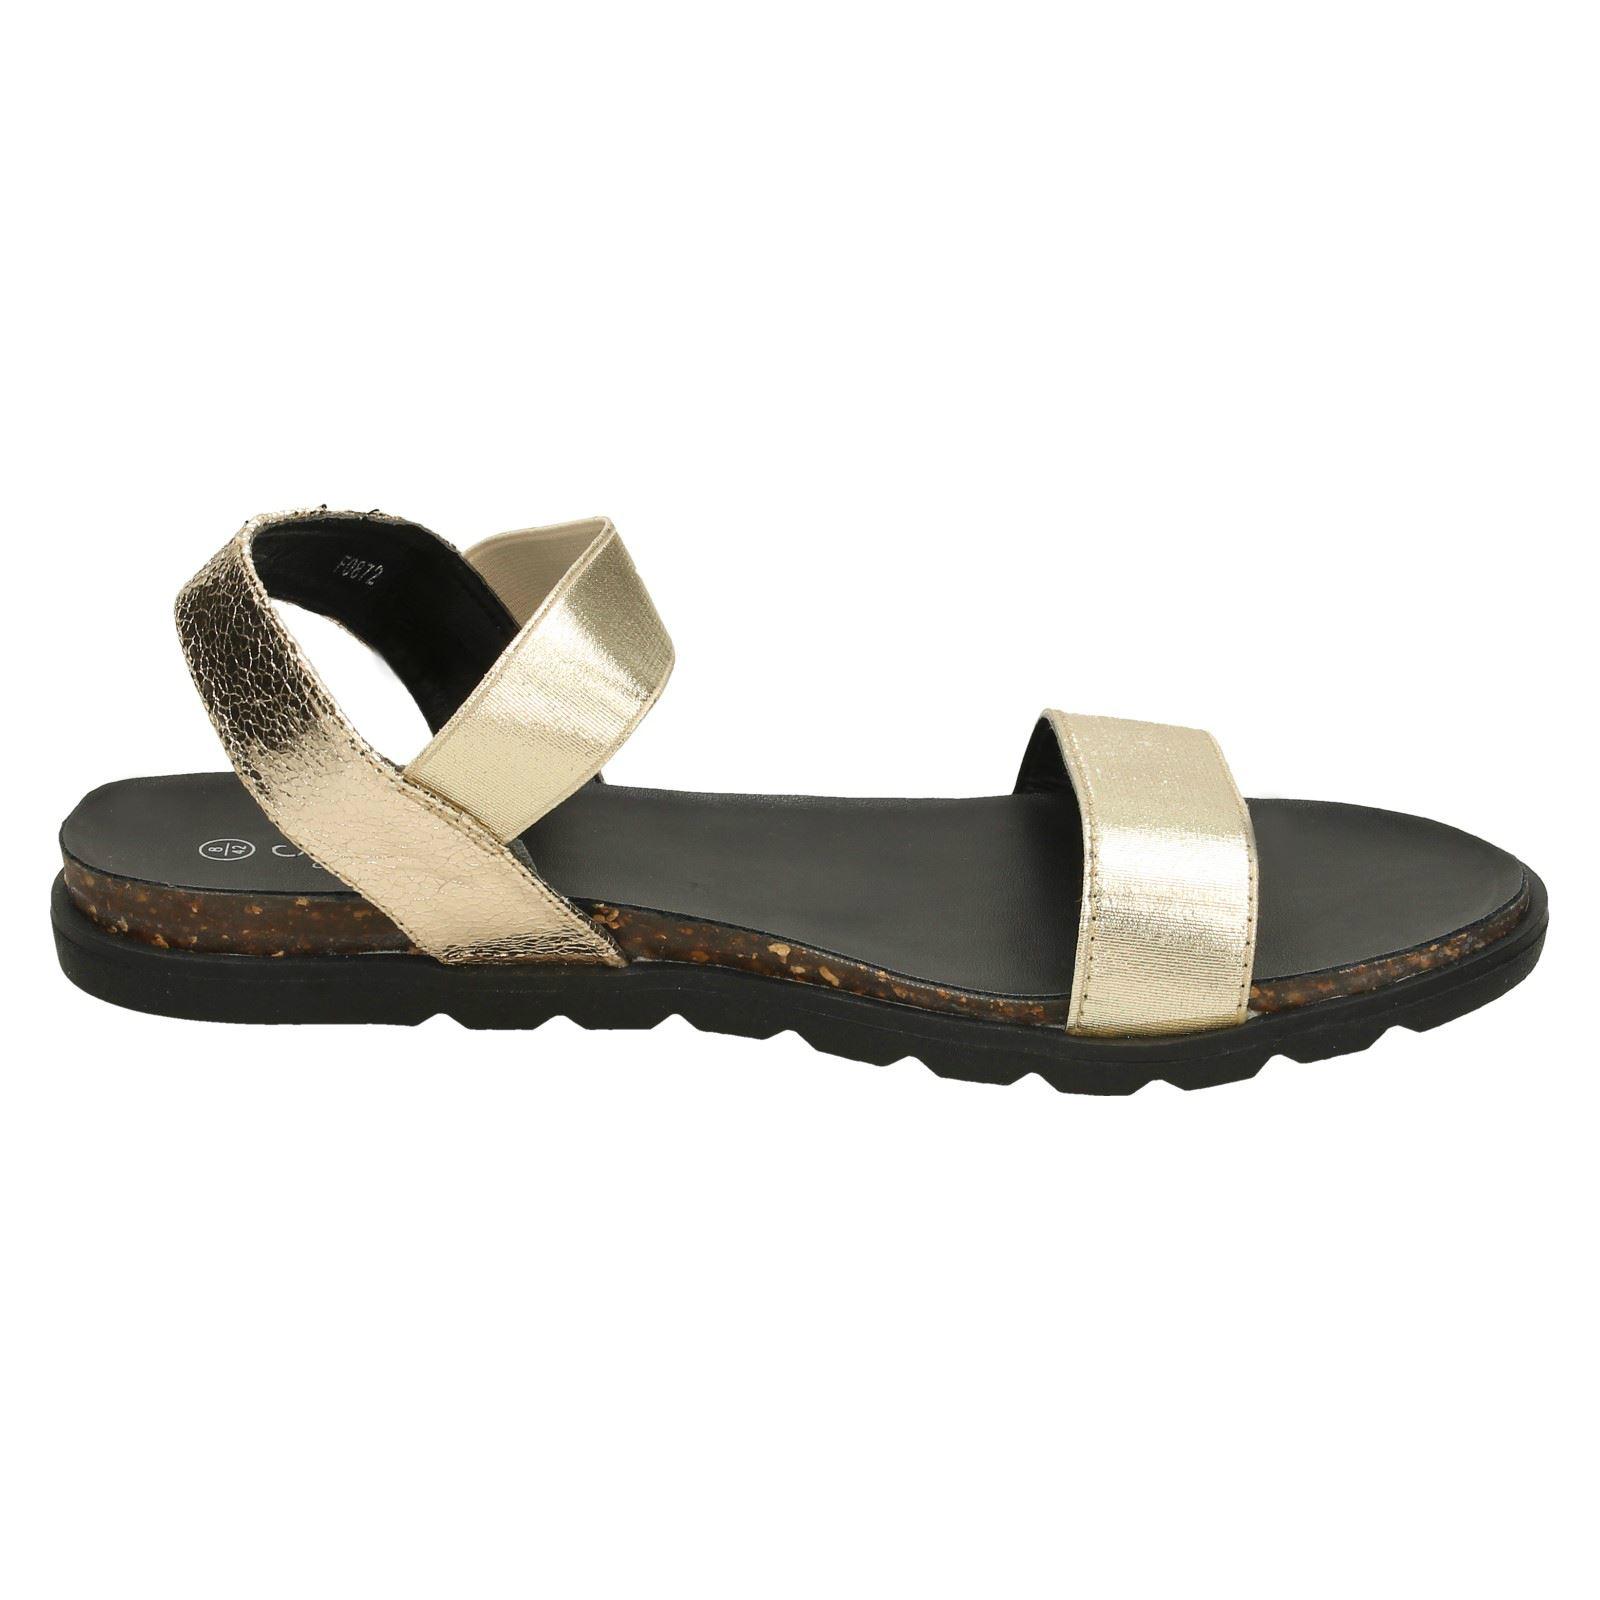 Savannah L6R032 Ladies Black Toe Post Sandals R21A